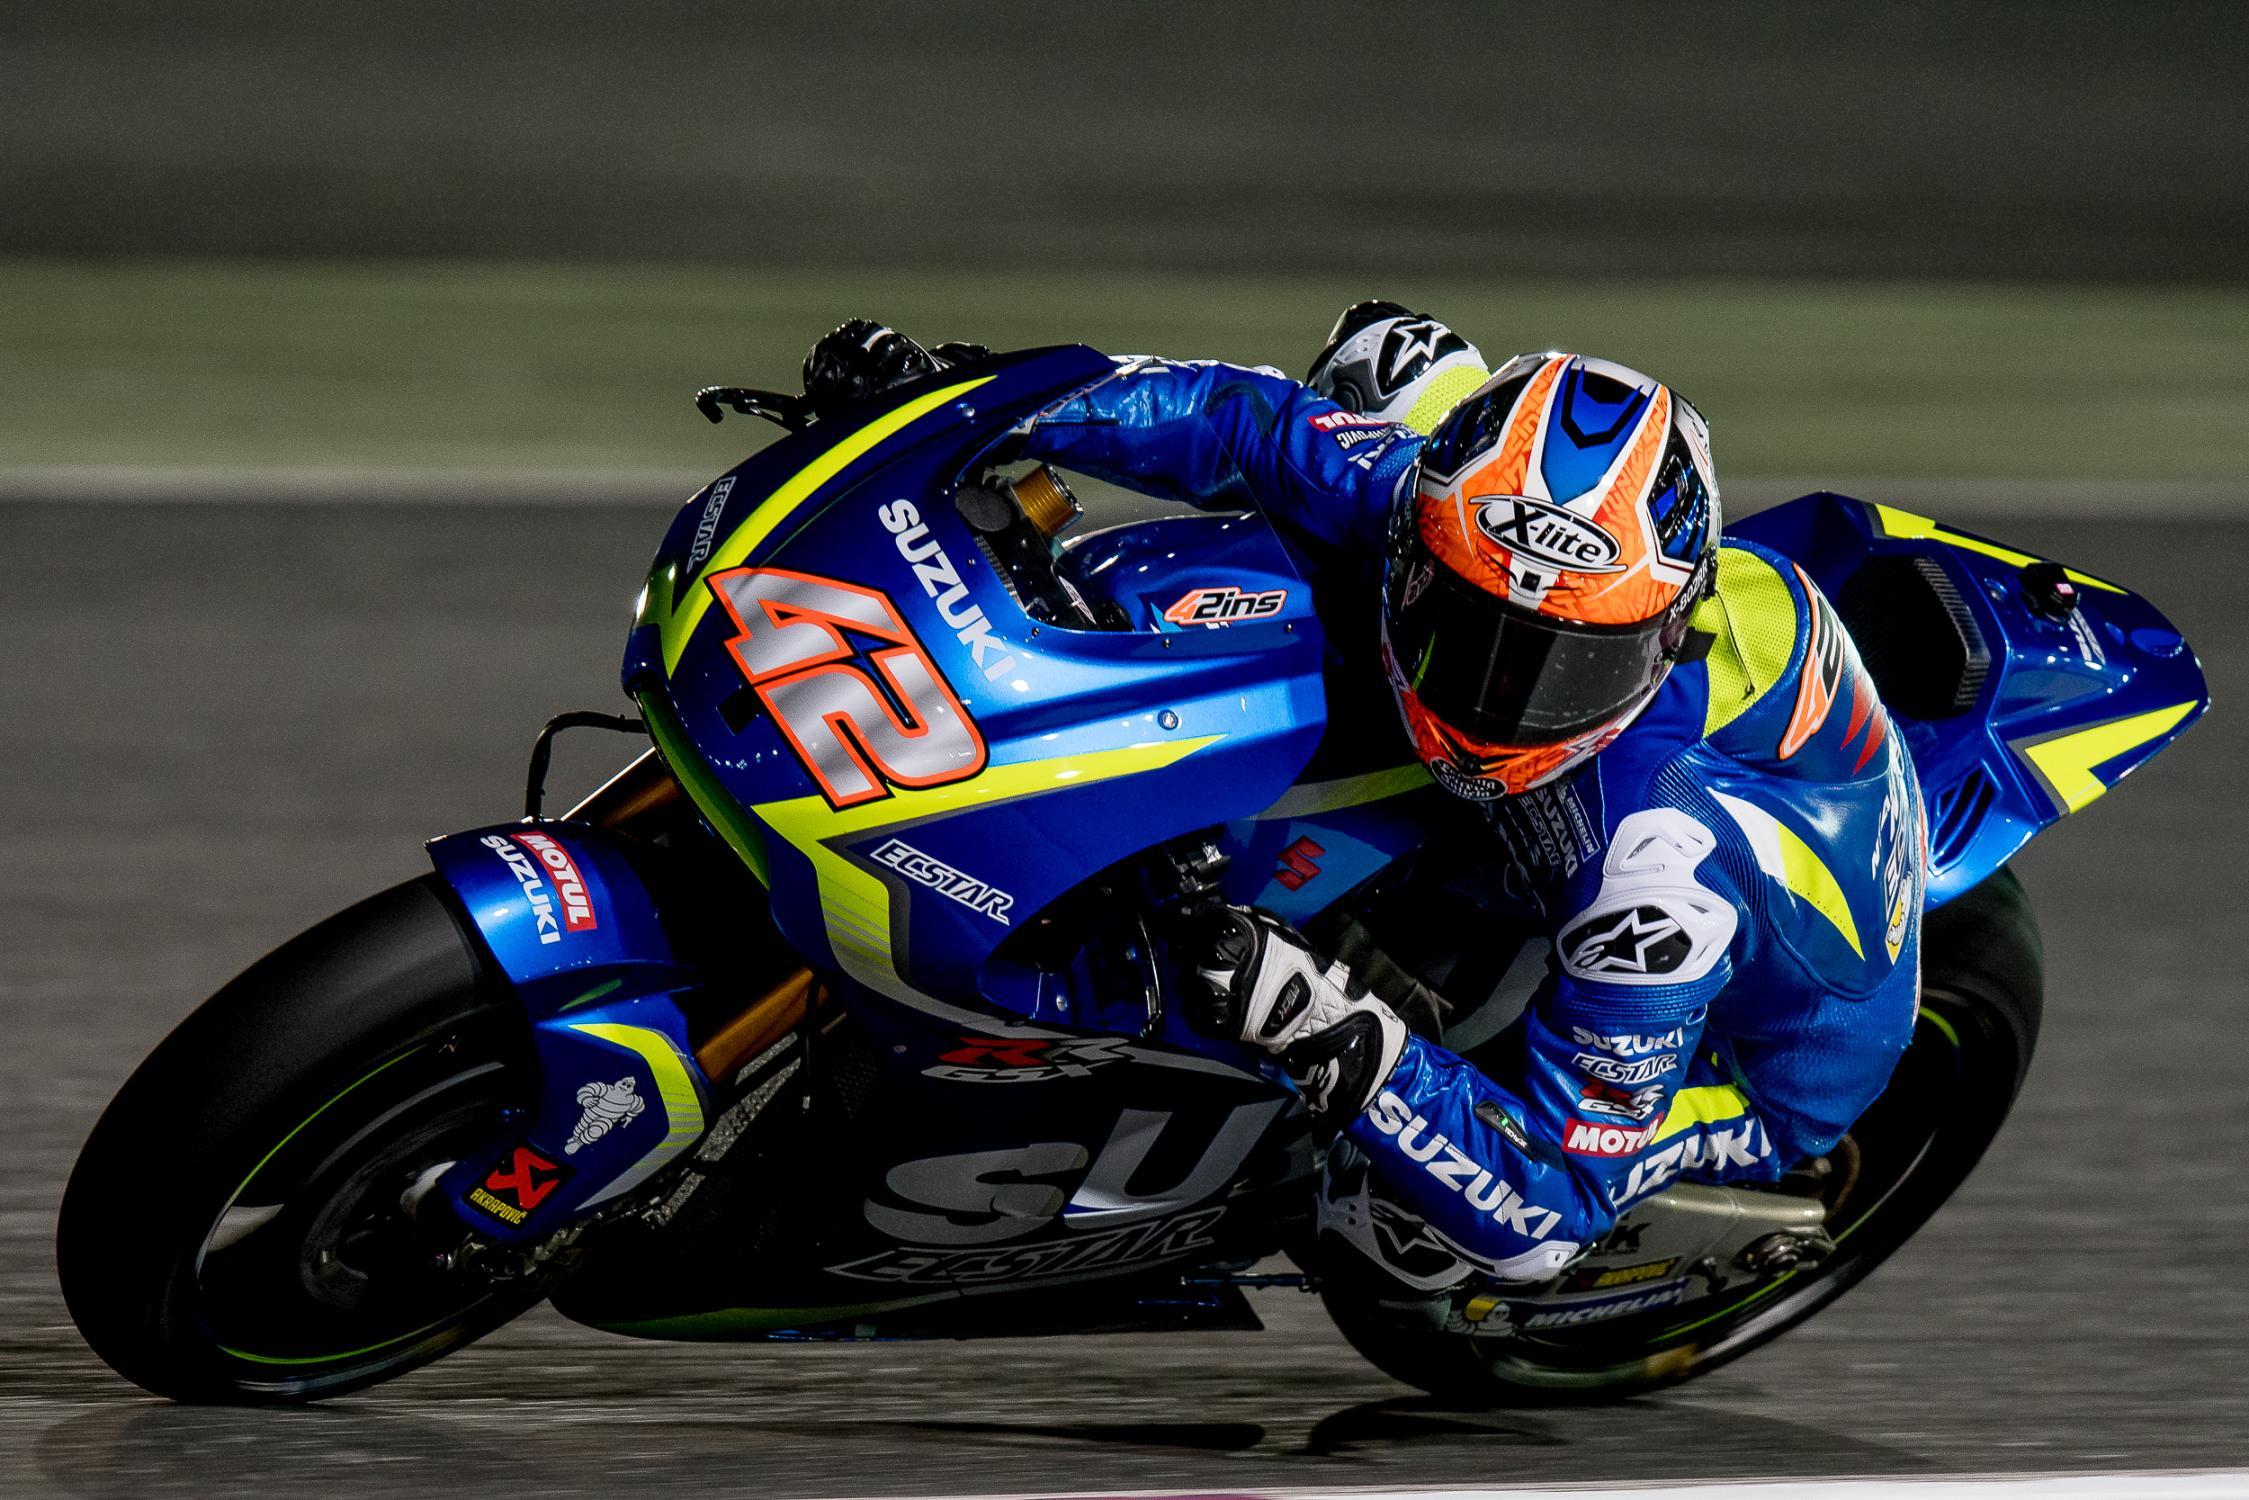 [MotoGP] Test Losail 42-alex-rins-espdsc_5736.gallery_full_top_fullscreen